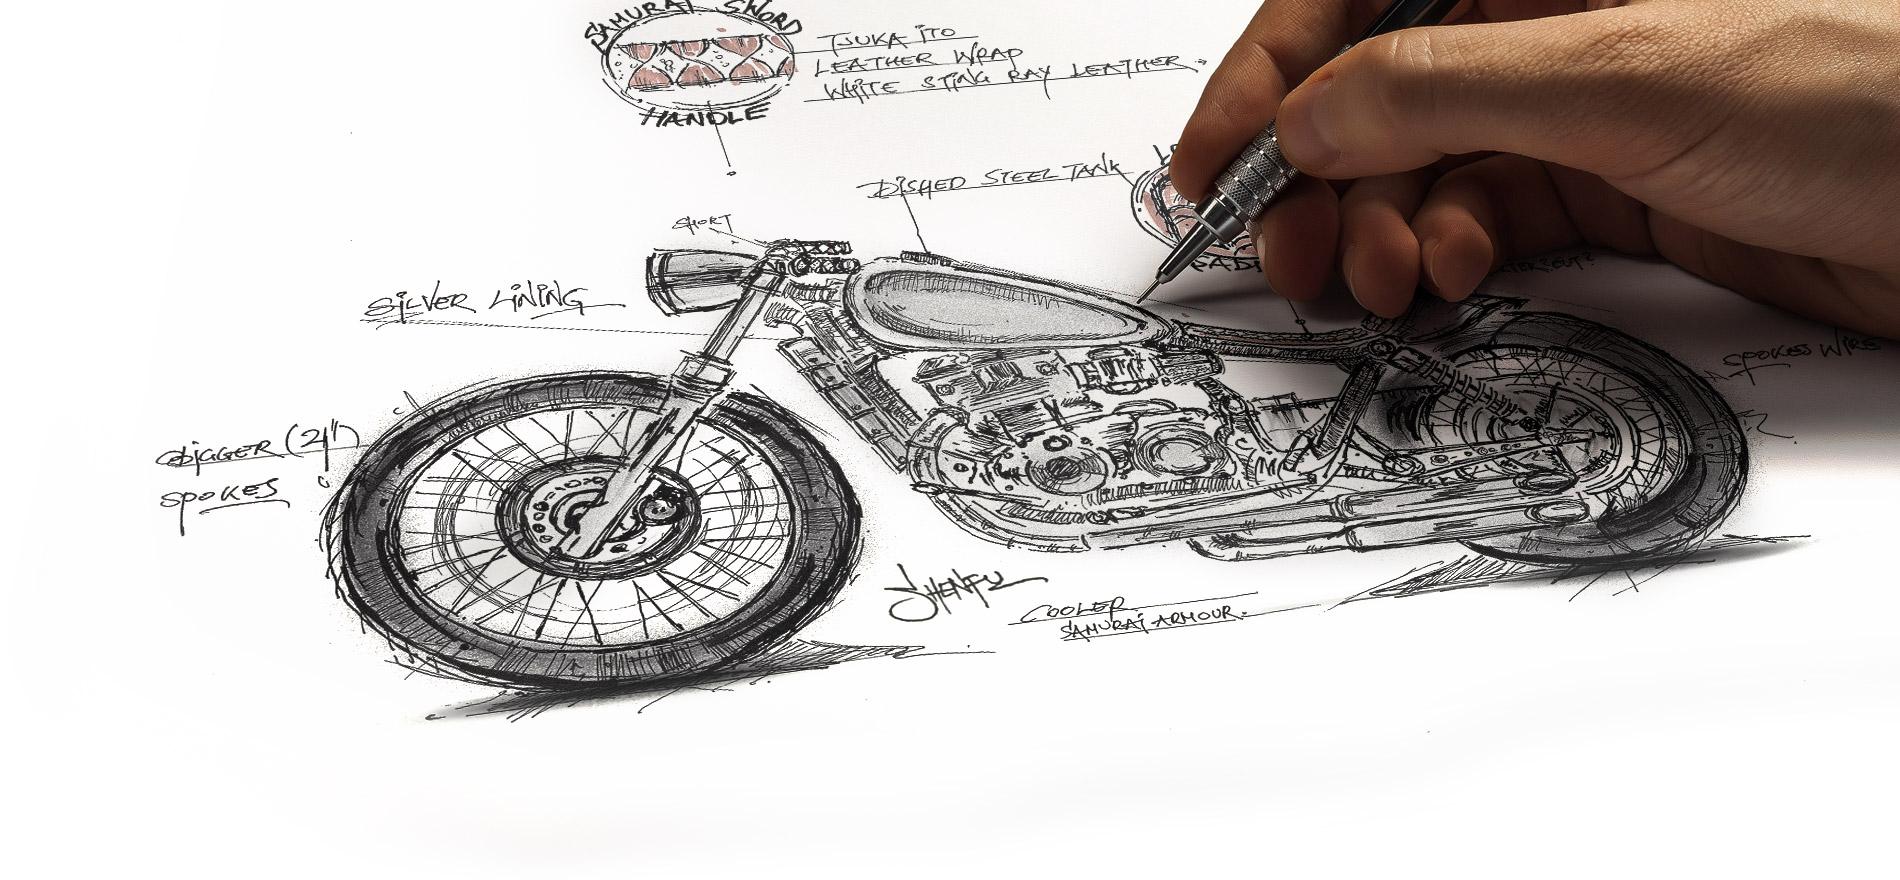 Titan_CustomBikes_CafeRacer_Austria-Atelier_SHENFU_Art-of-Custom-Bike-Concept-Design_Idea_Illustration_Digital_Artwork_Motorycle-Drawing-Artwork_doodle